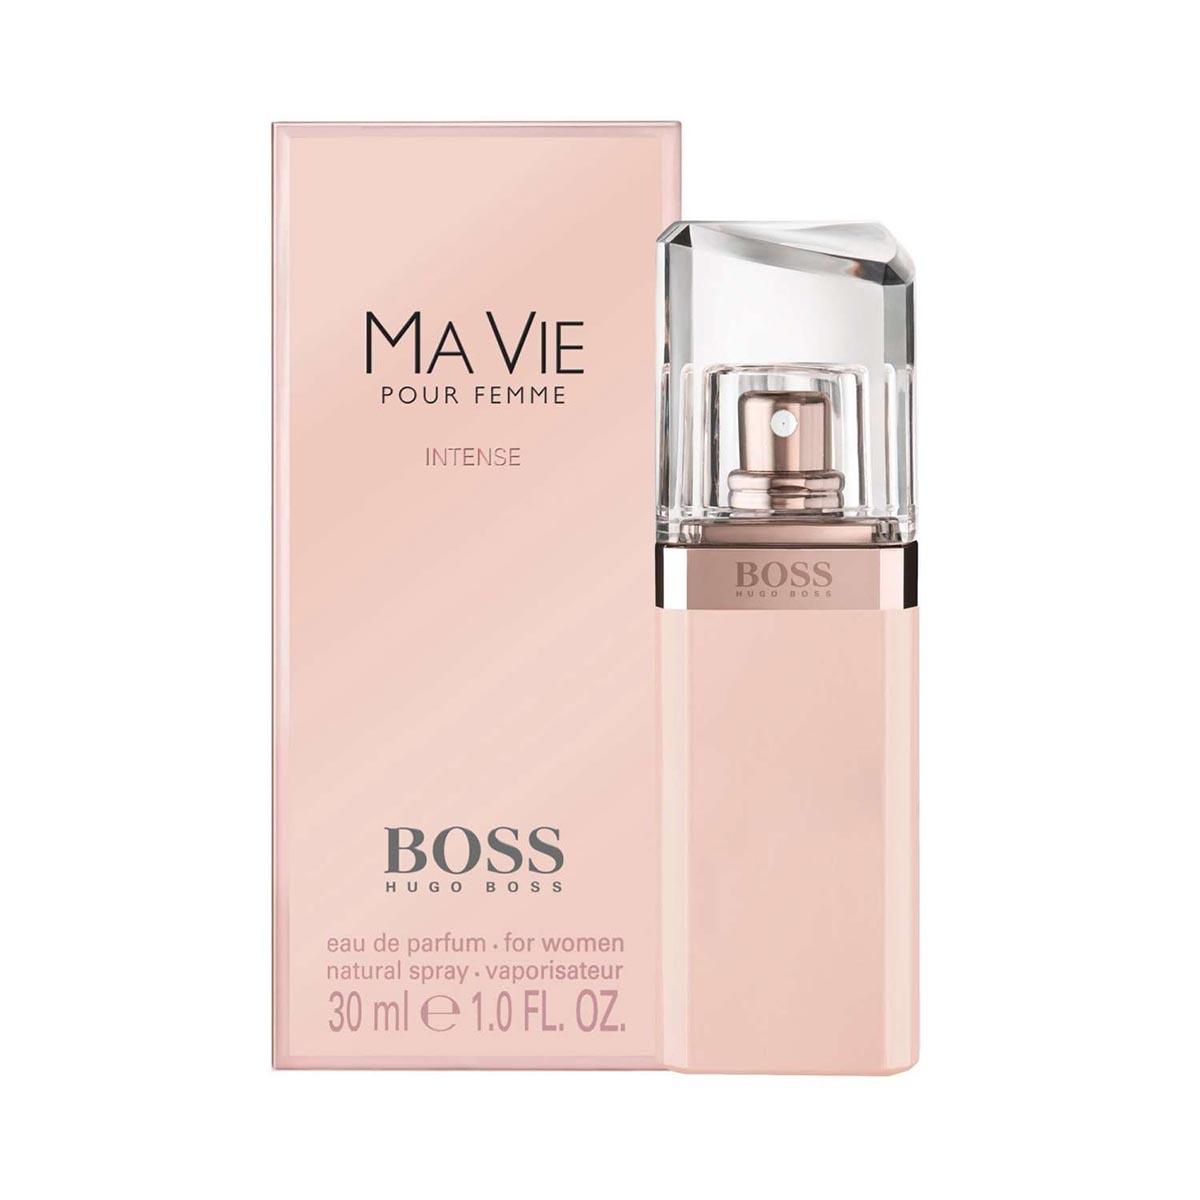 Hugo boss ma vie intense eau de parfum 30ml vaporizador